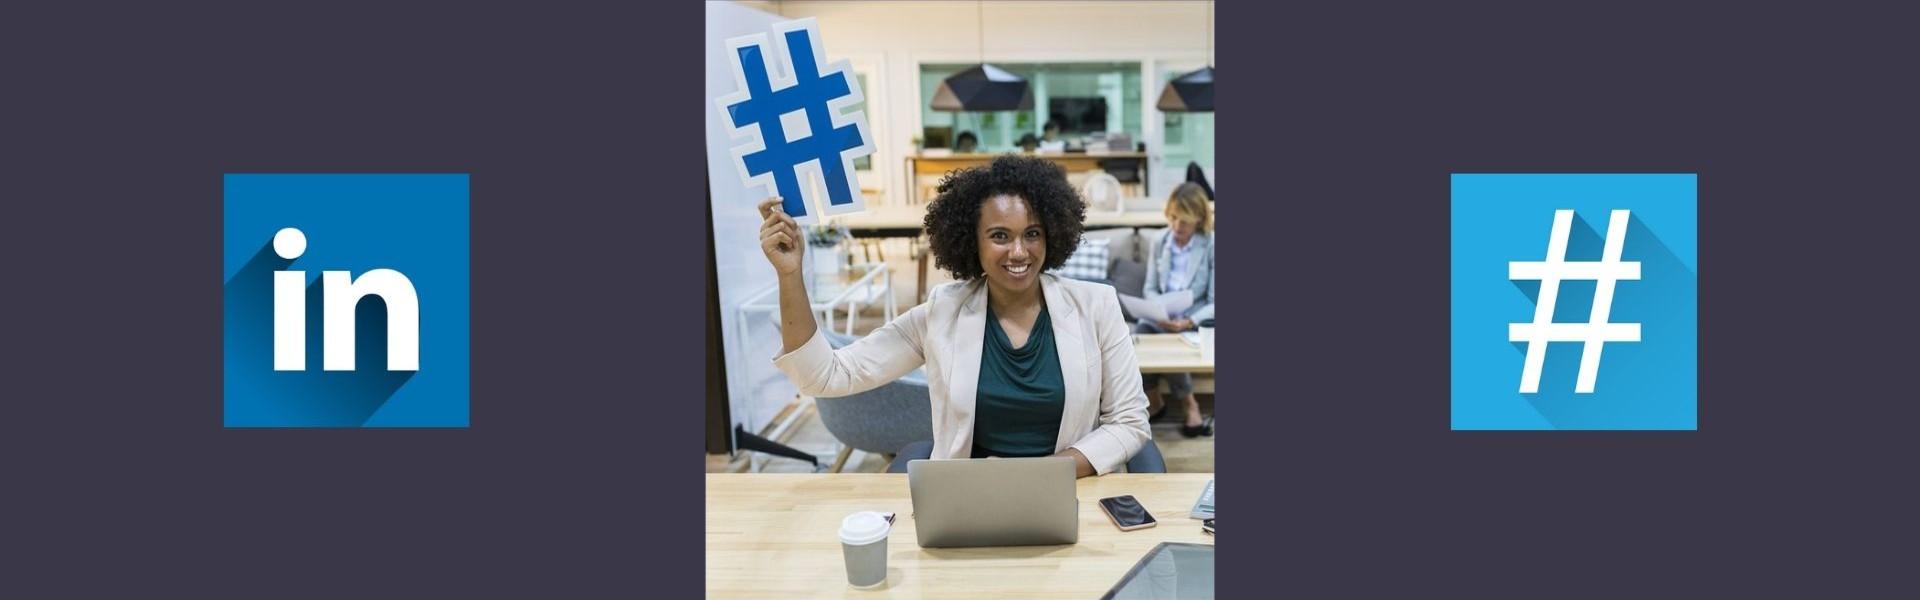 How to handle hashtags on LinkedIn